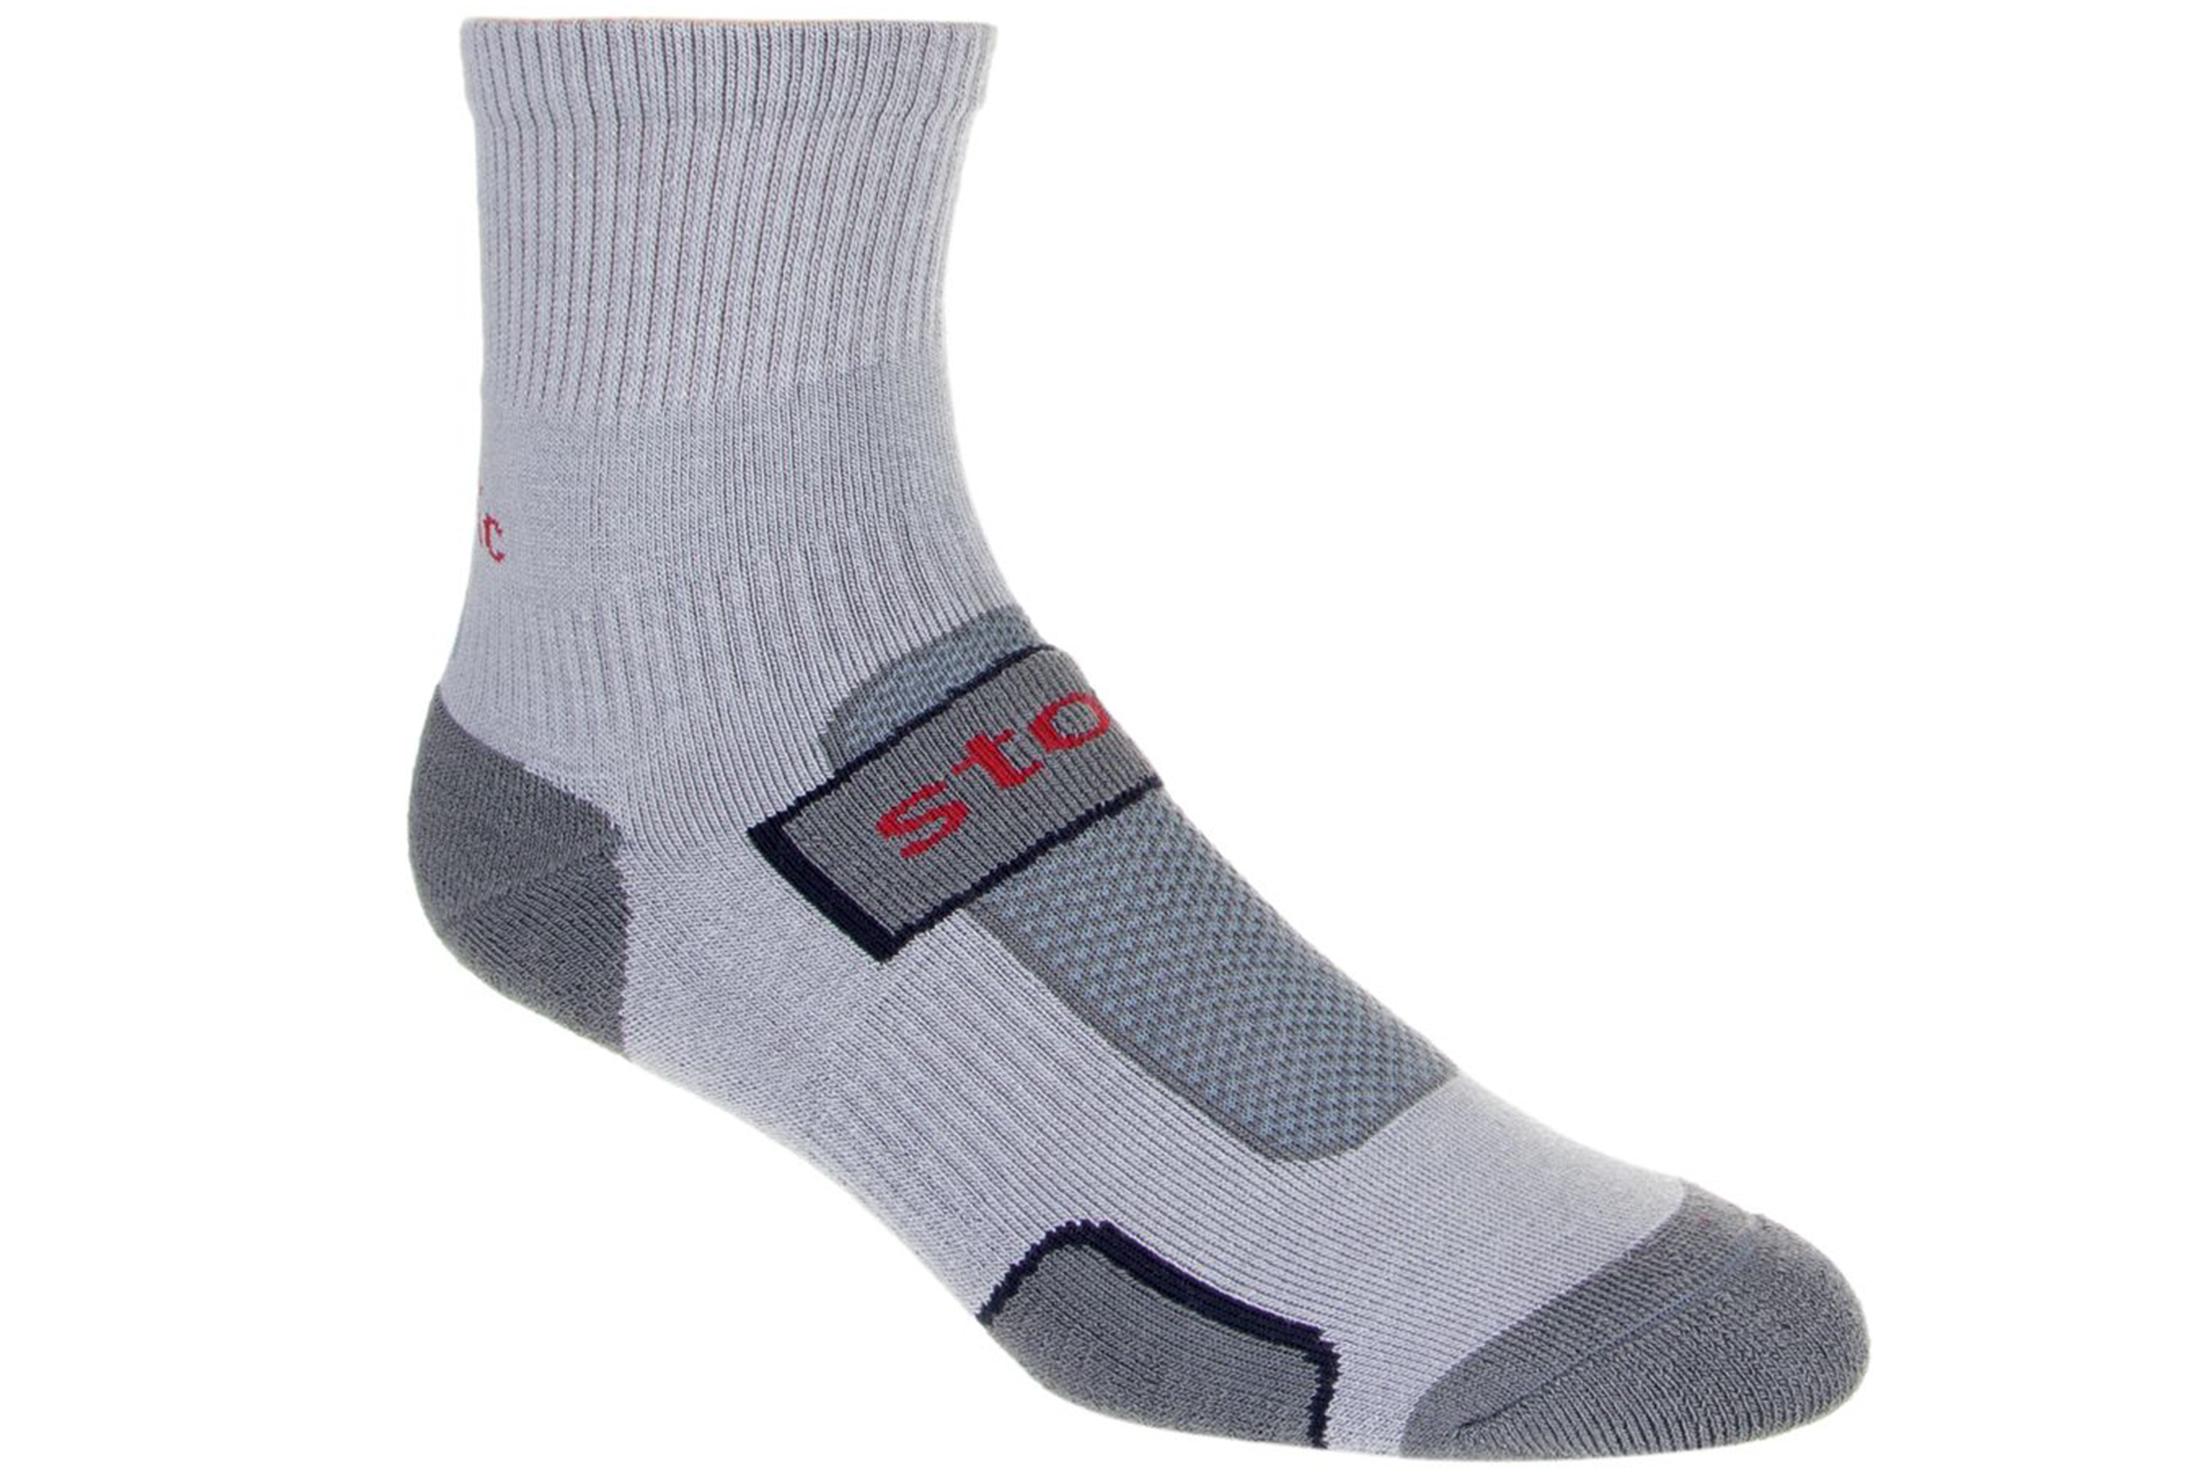 Stoic Merino Comp Trail Sock